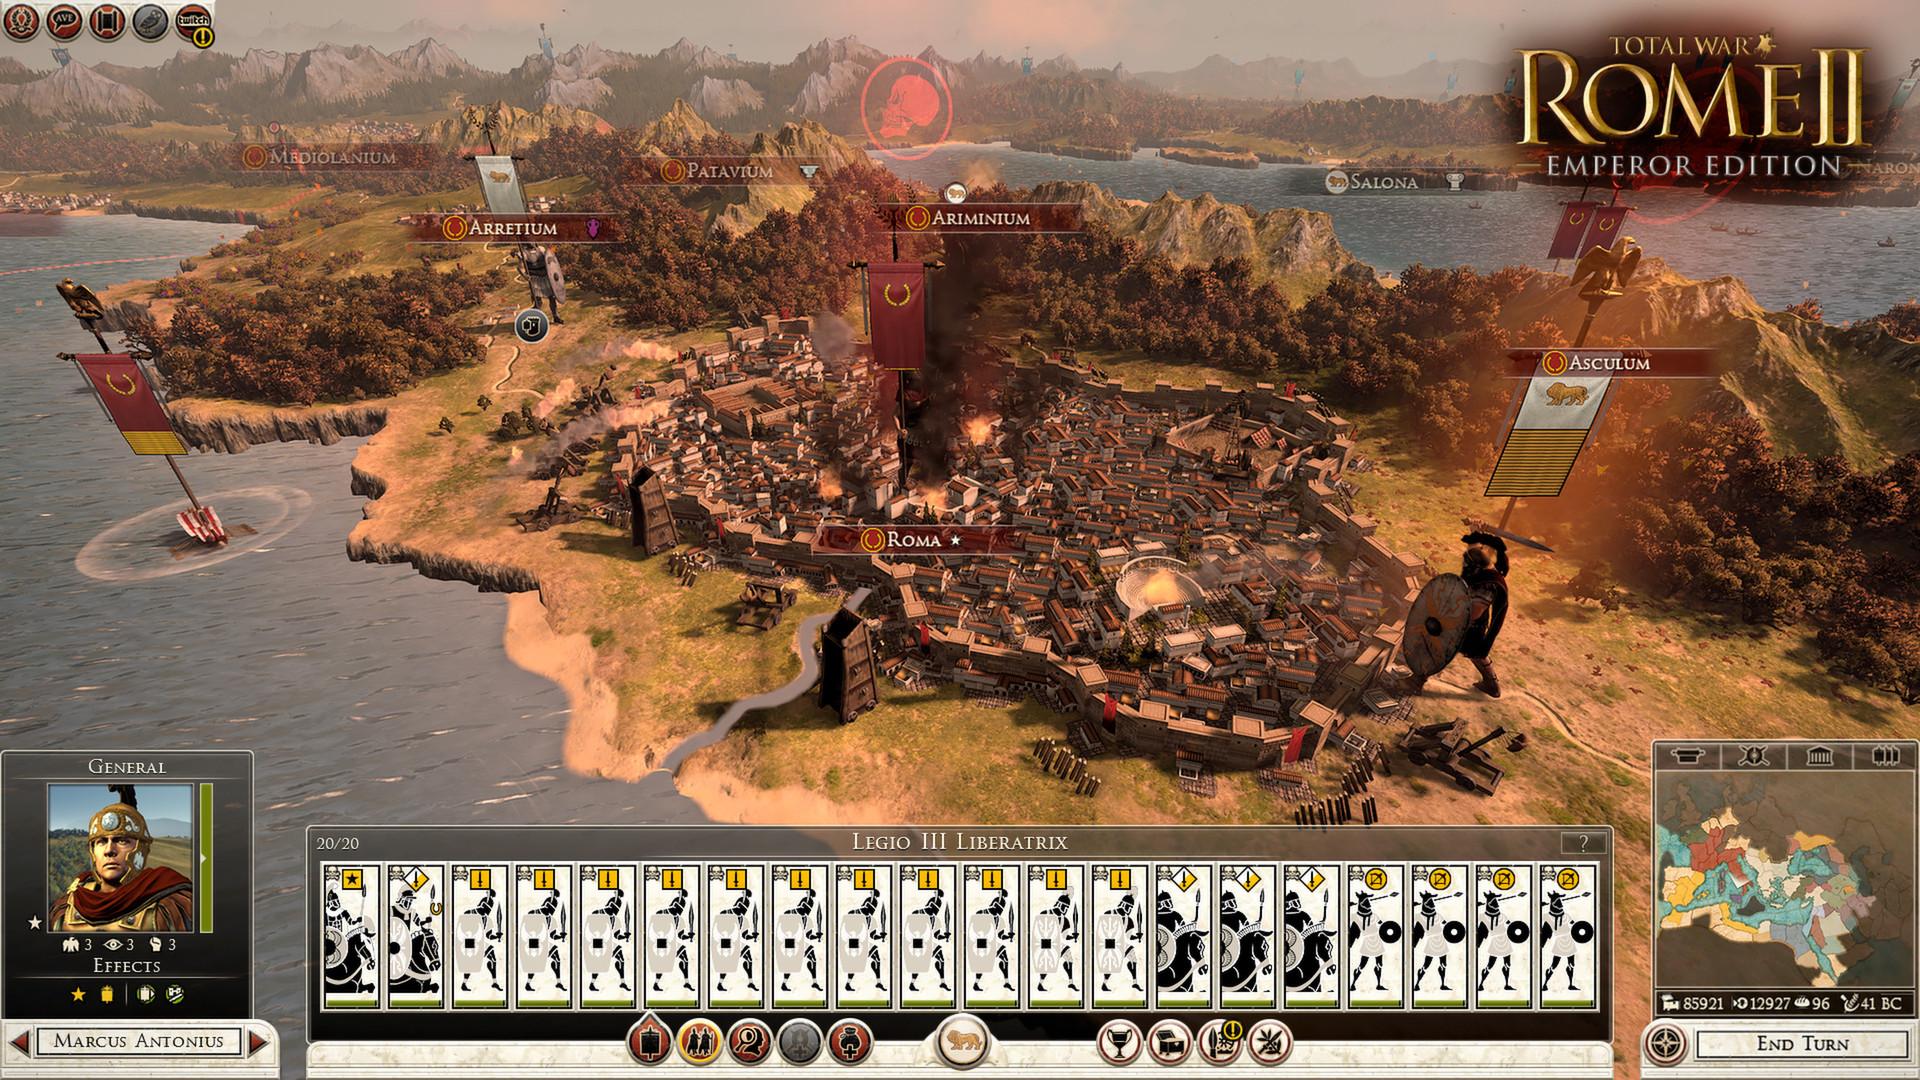 pc game rome total war 2